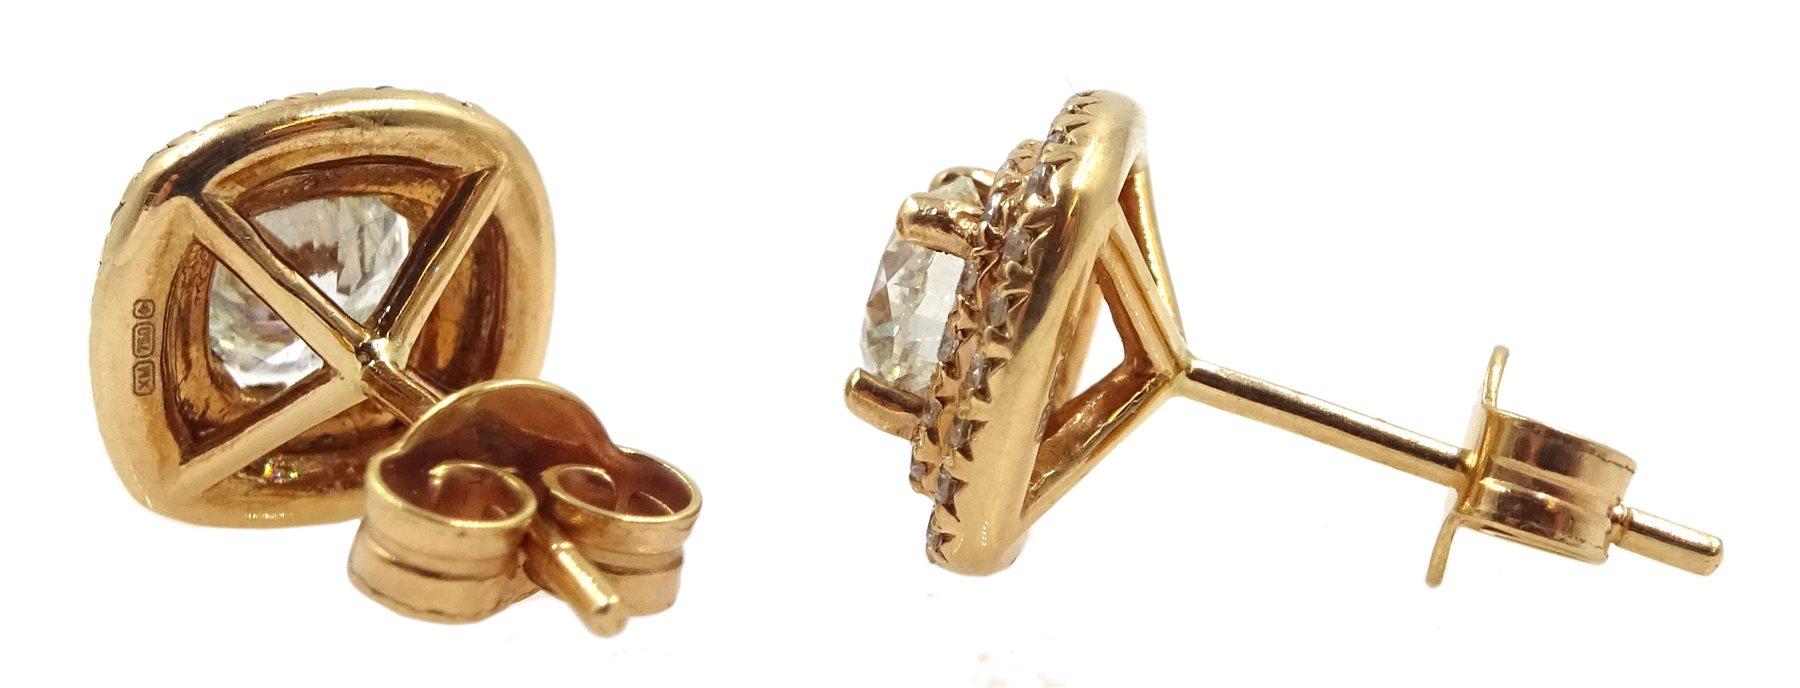 Pair of 18ct gold diamond cluster stud earrings - Image 2 of 2